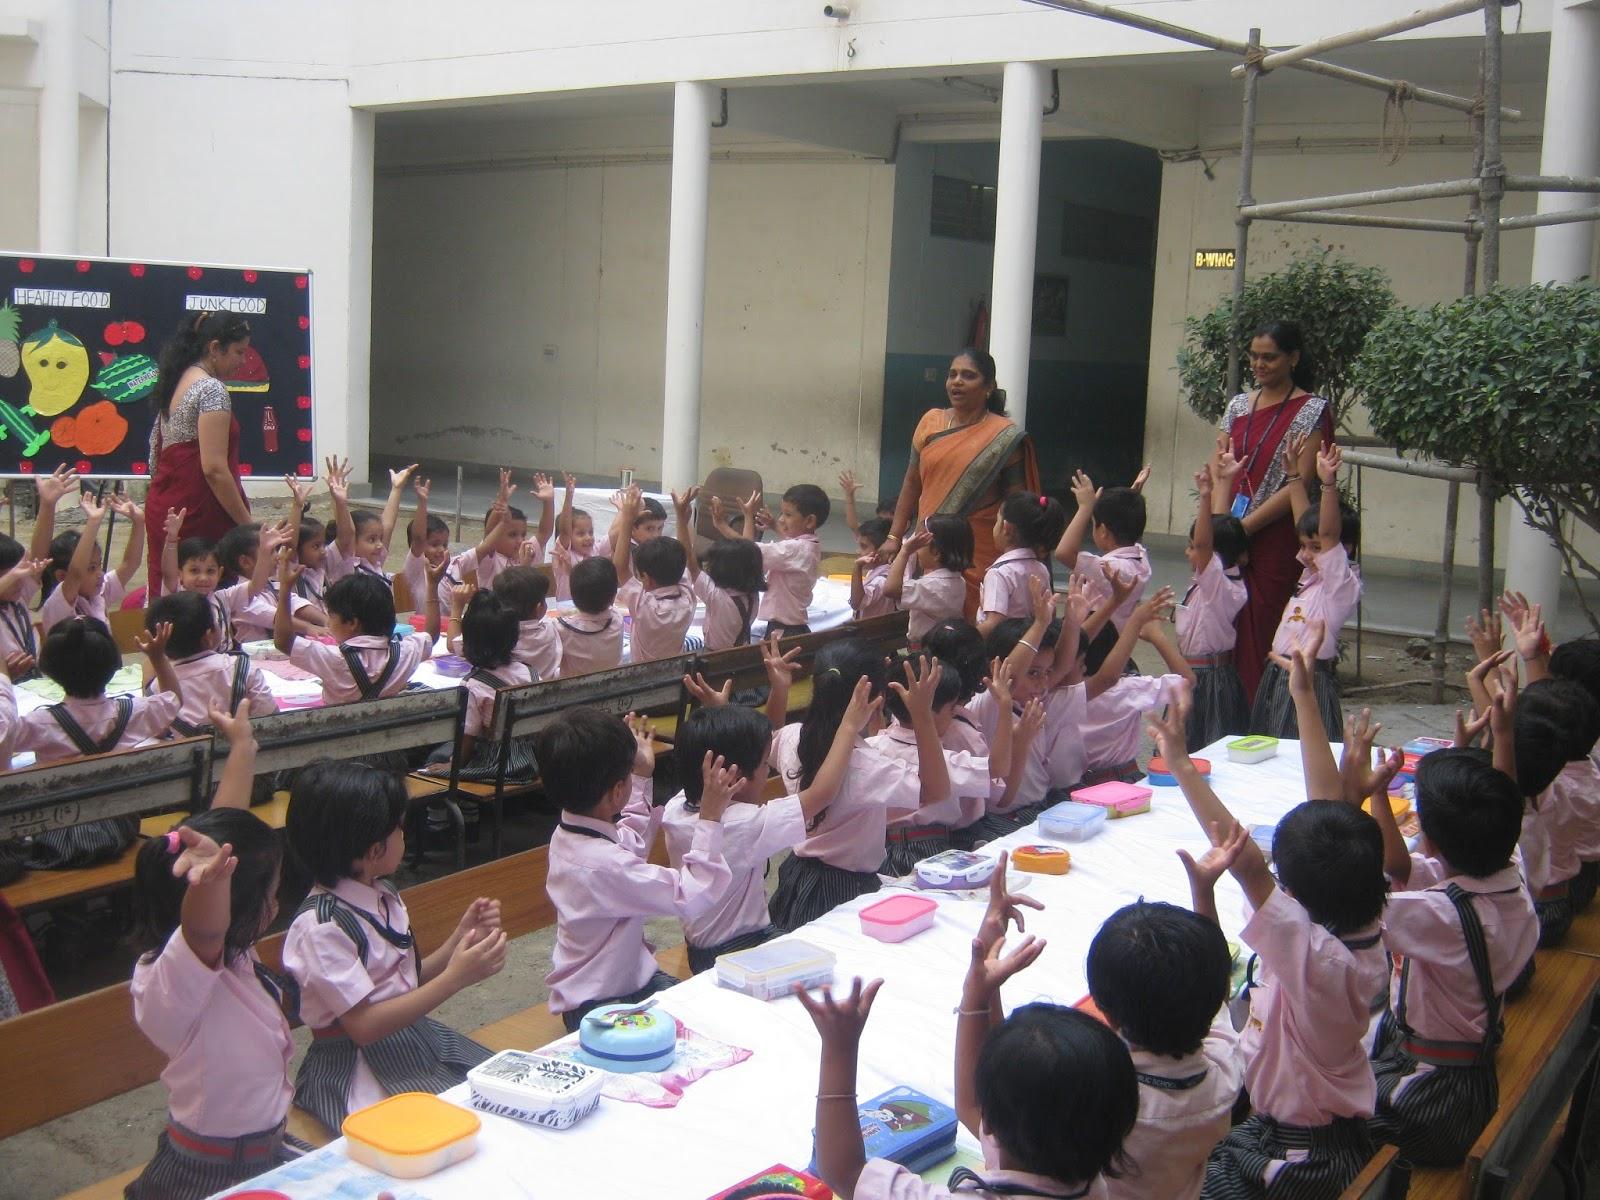 Saint Sol R Public School Pratap Nagar Jaipur Healthy Food And Junk Food Activity